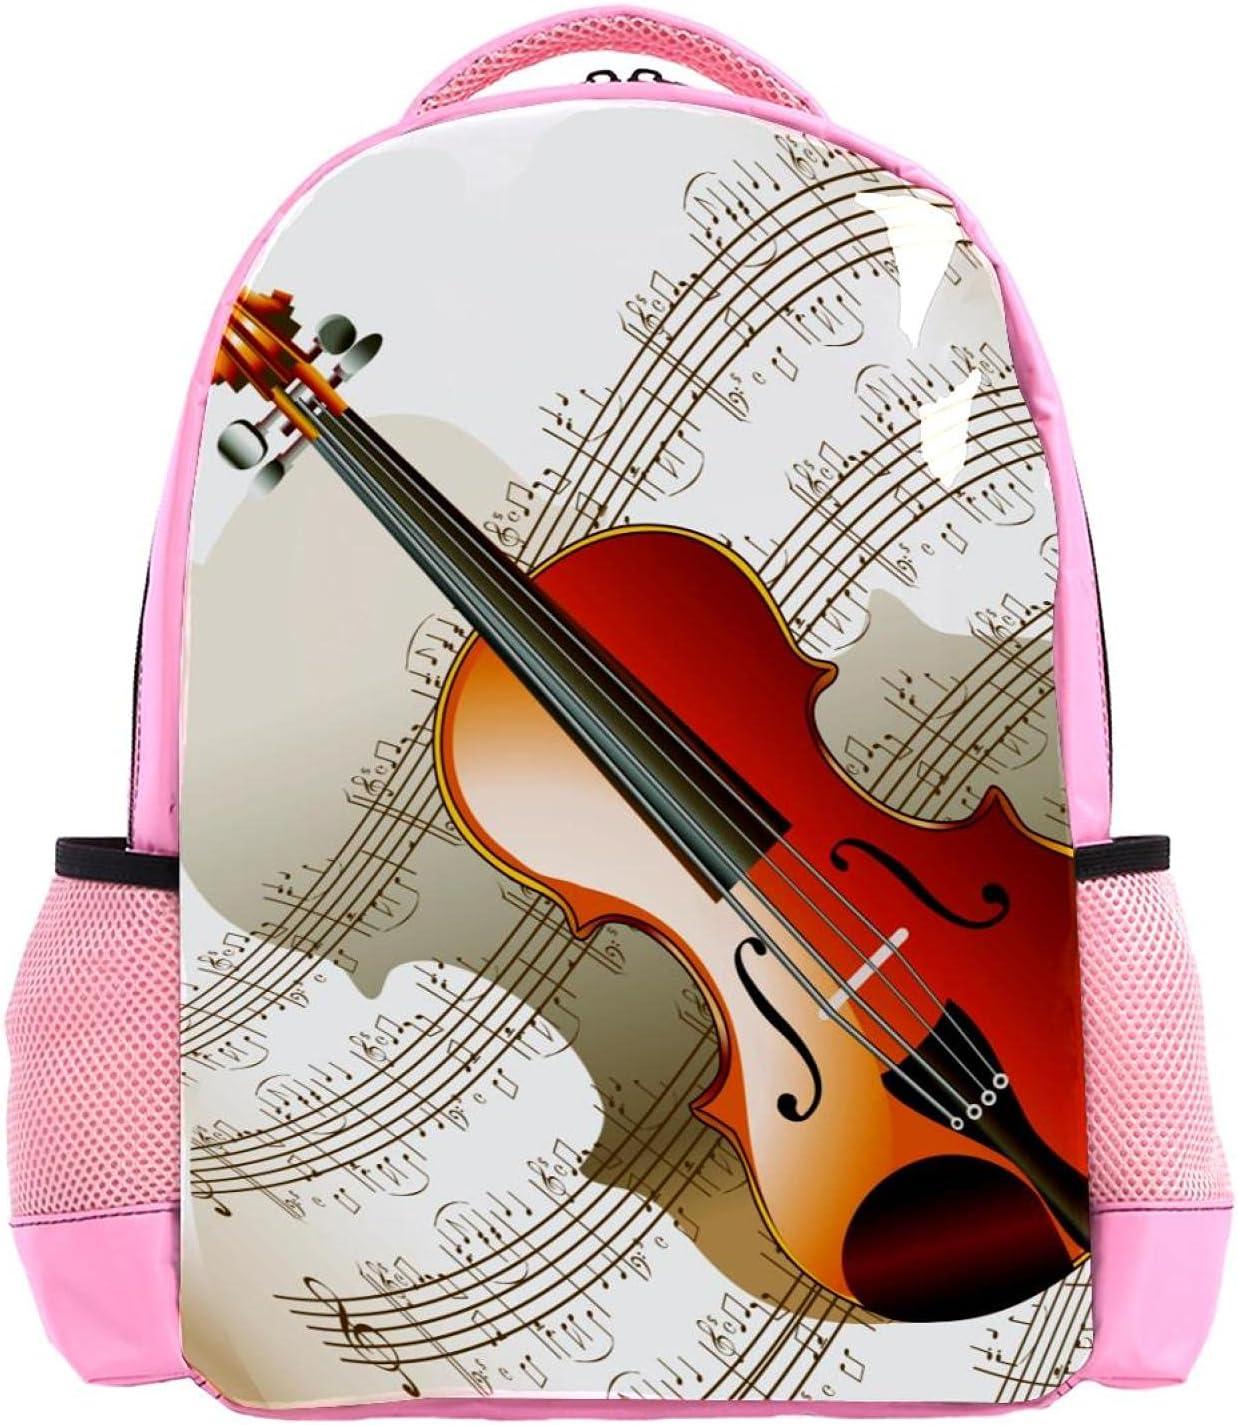 Universal Stylish Rucksack music violin Fees free art 2021 new